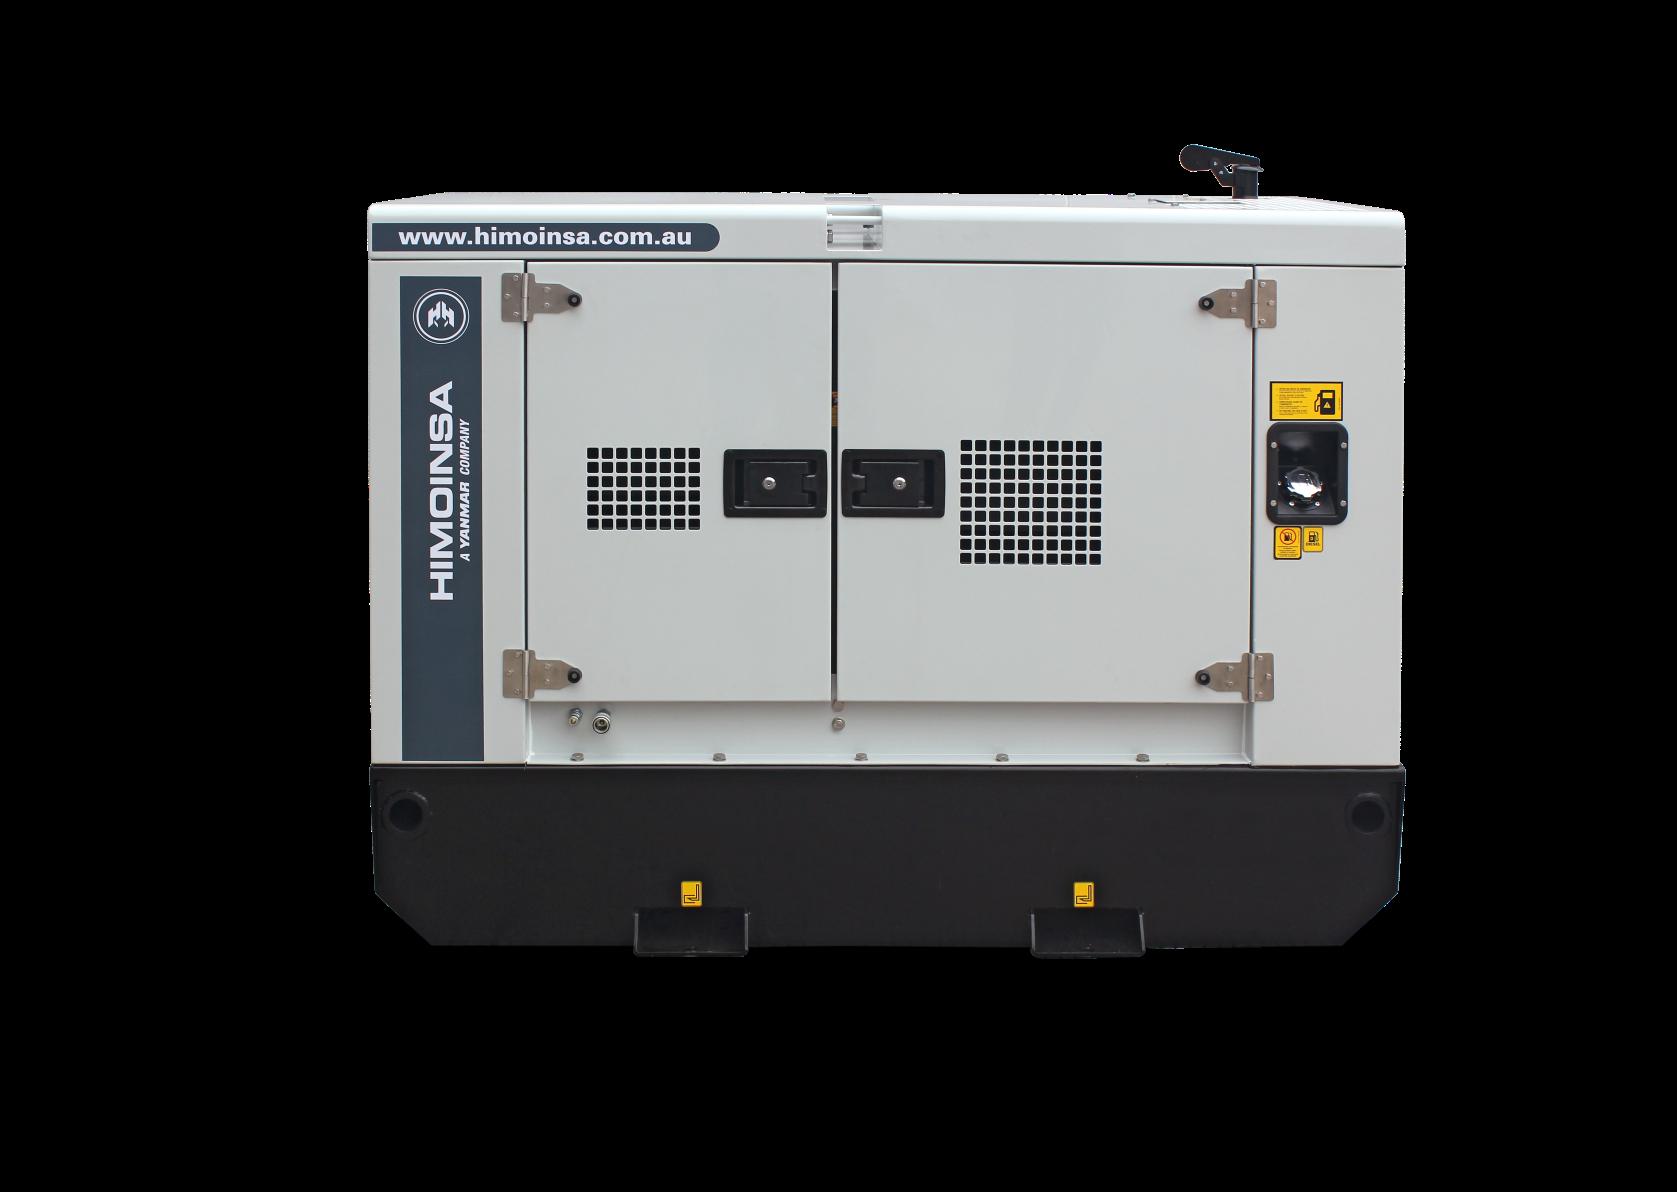 YANMAR – HIMOINSA HRYW-13 T5 Contractor Series